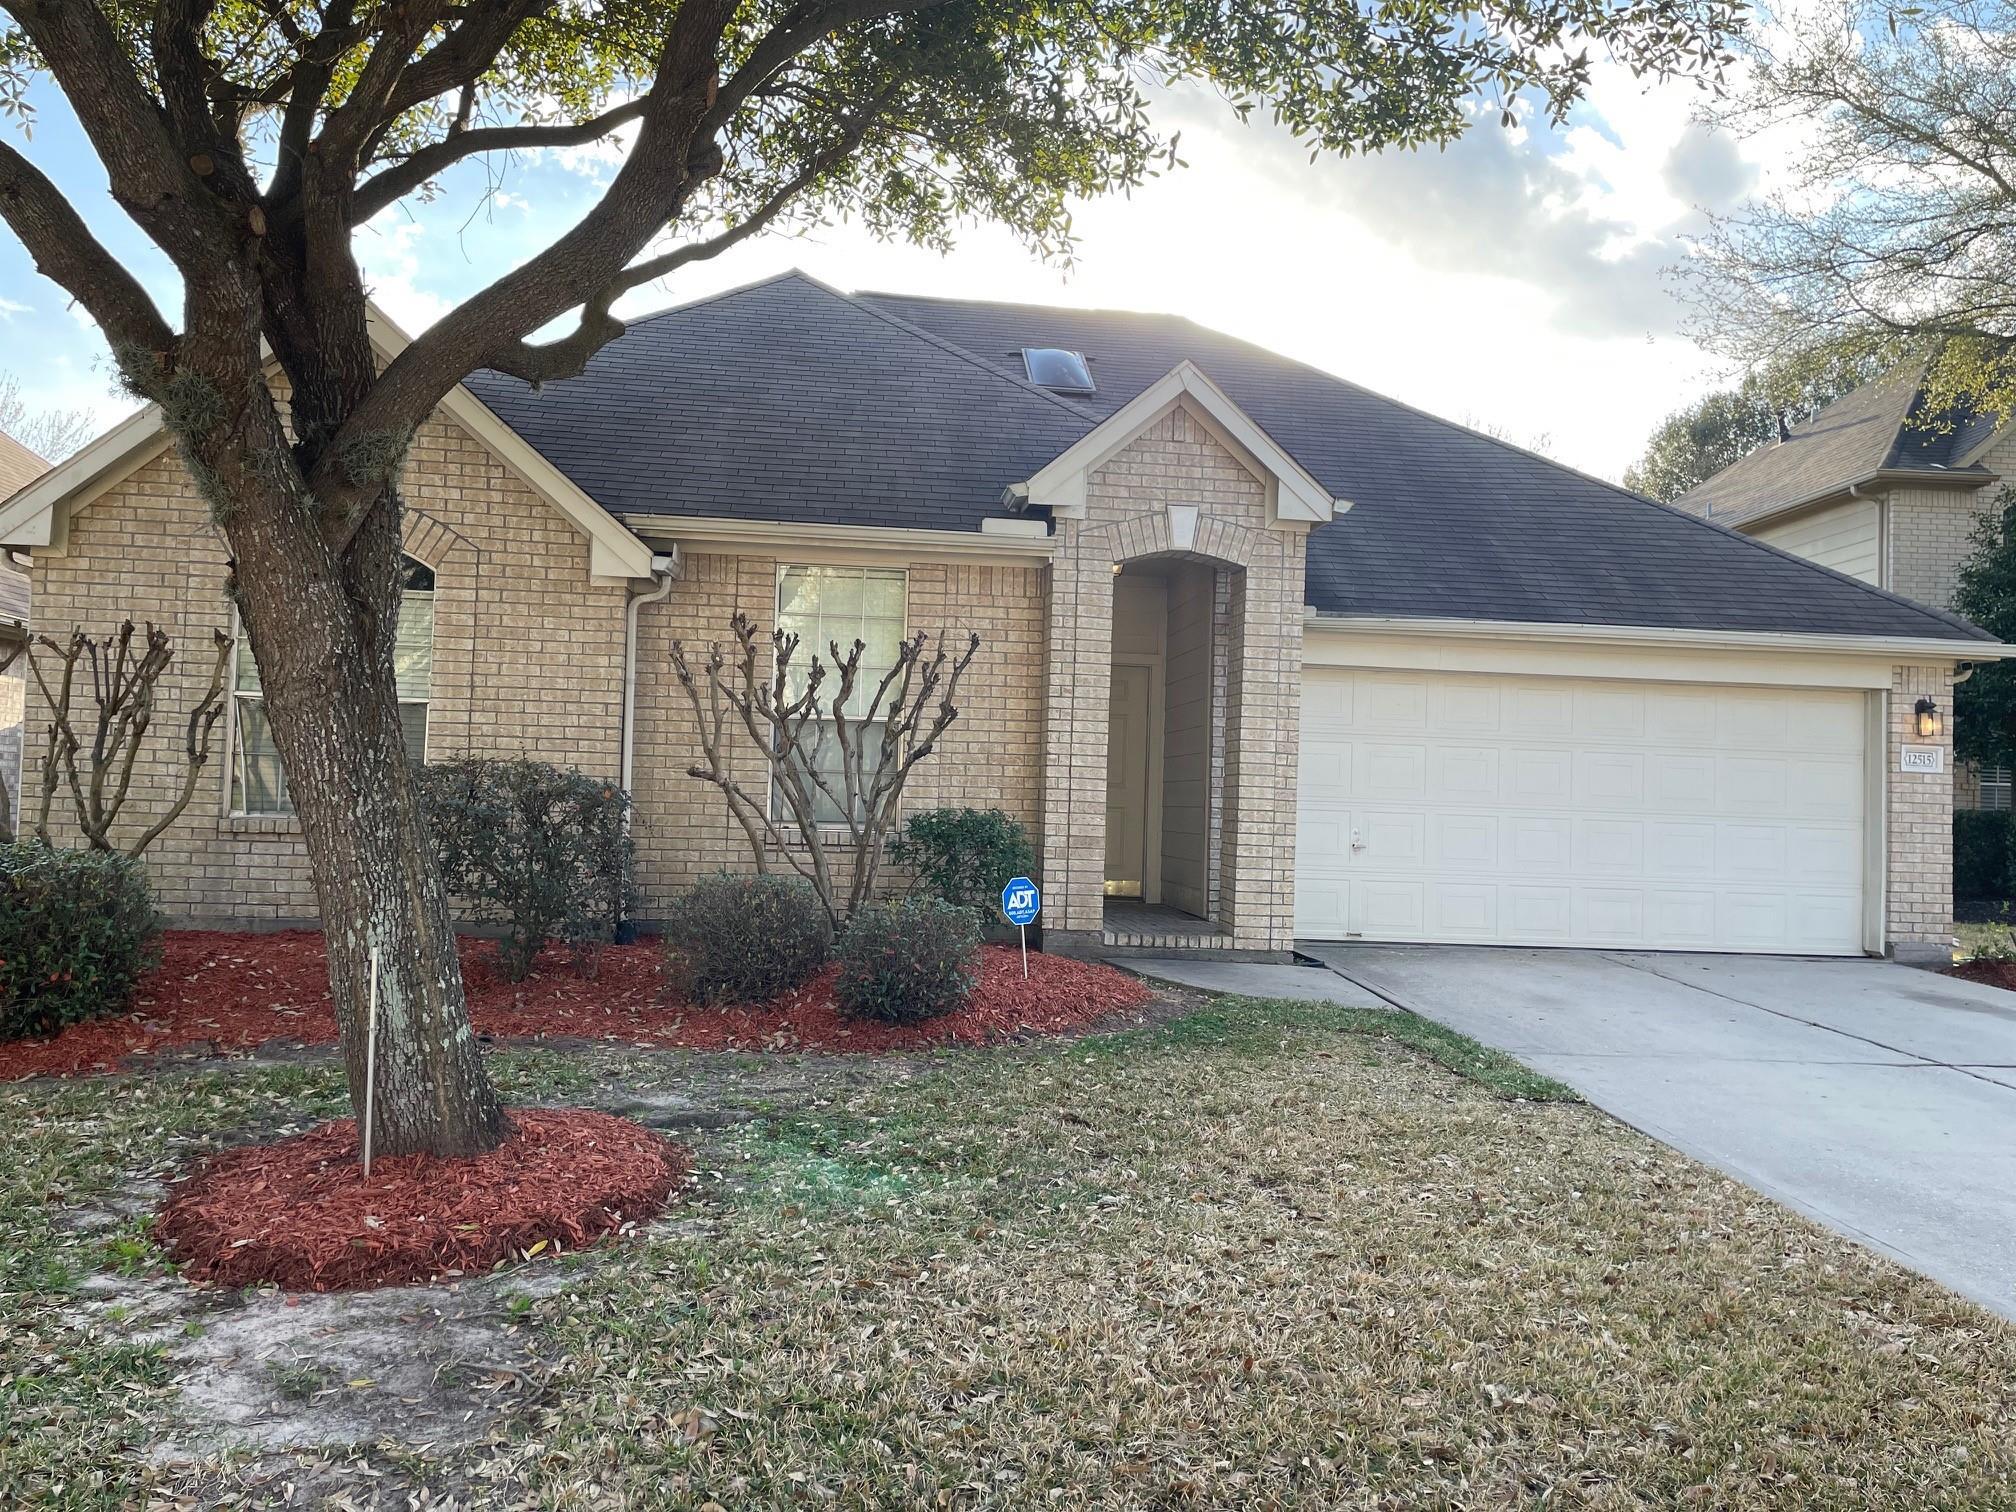 12515 Avery Vale Ln Property Photo - Houston, TX real estate listing